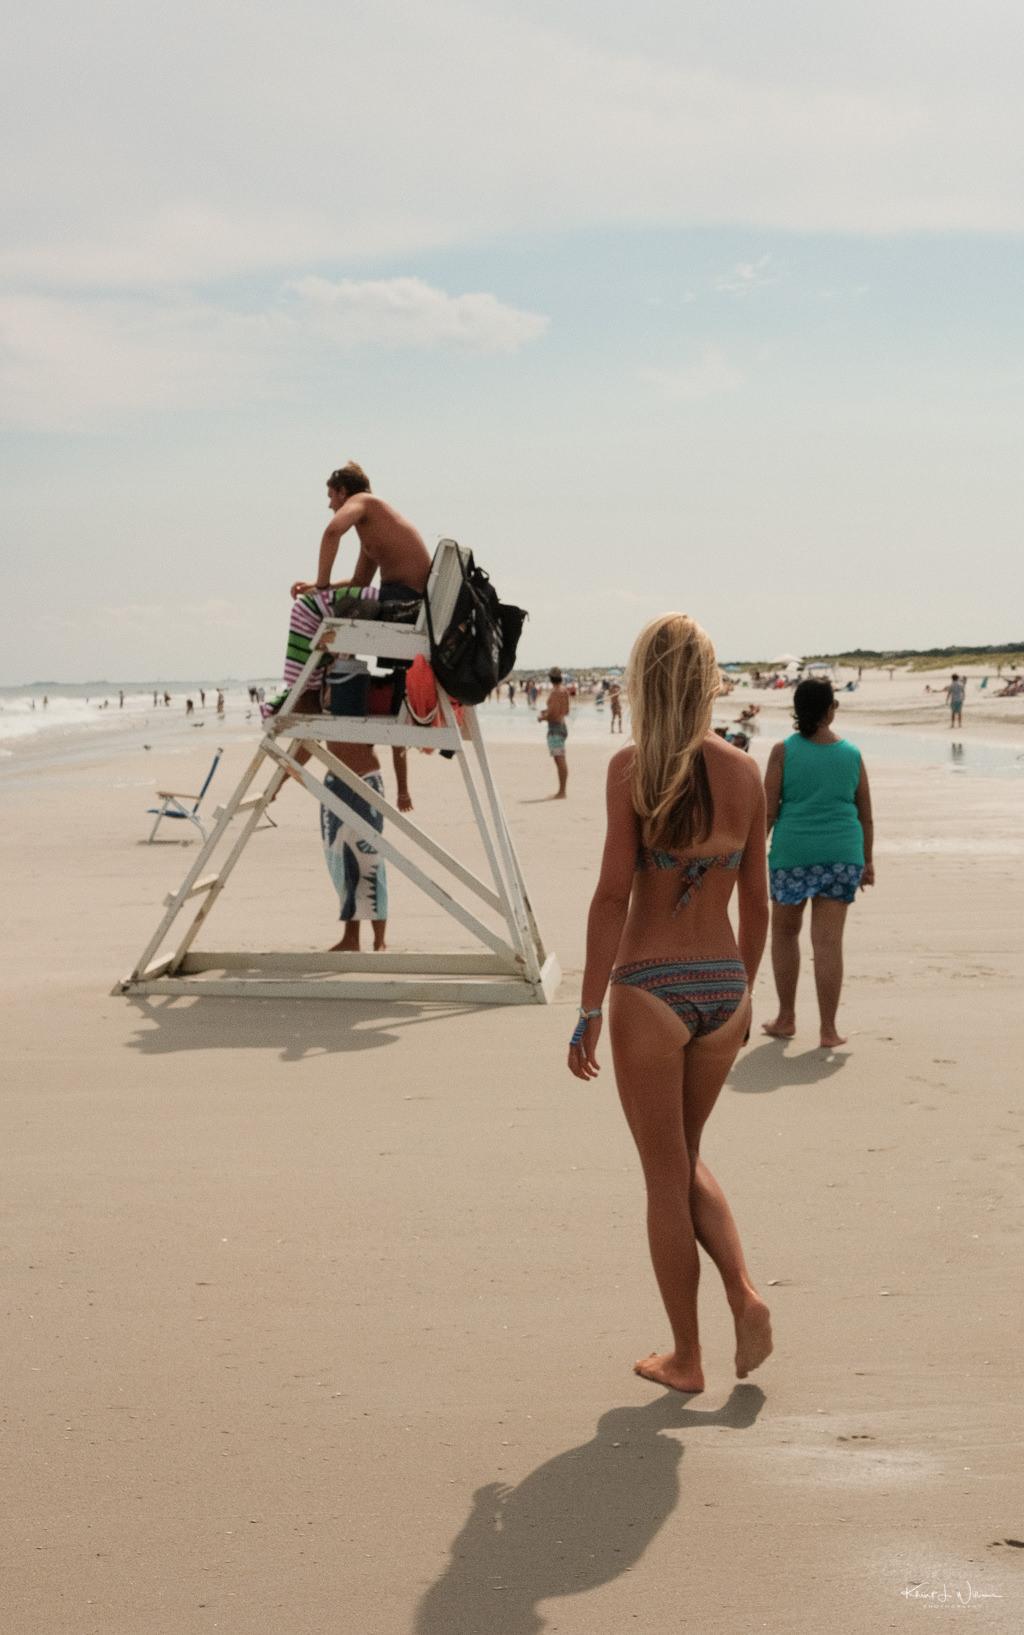 Young Woman Beach Scene